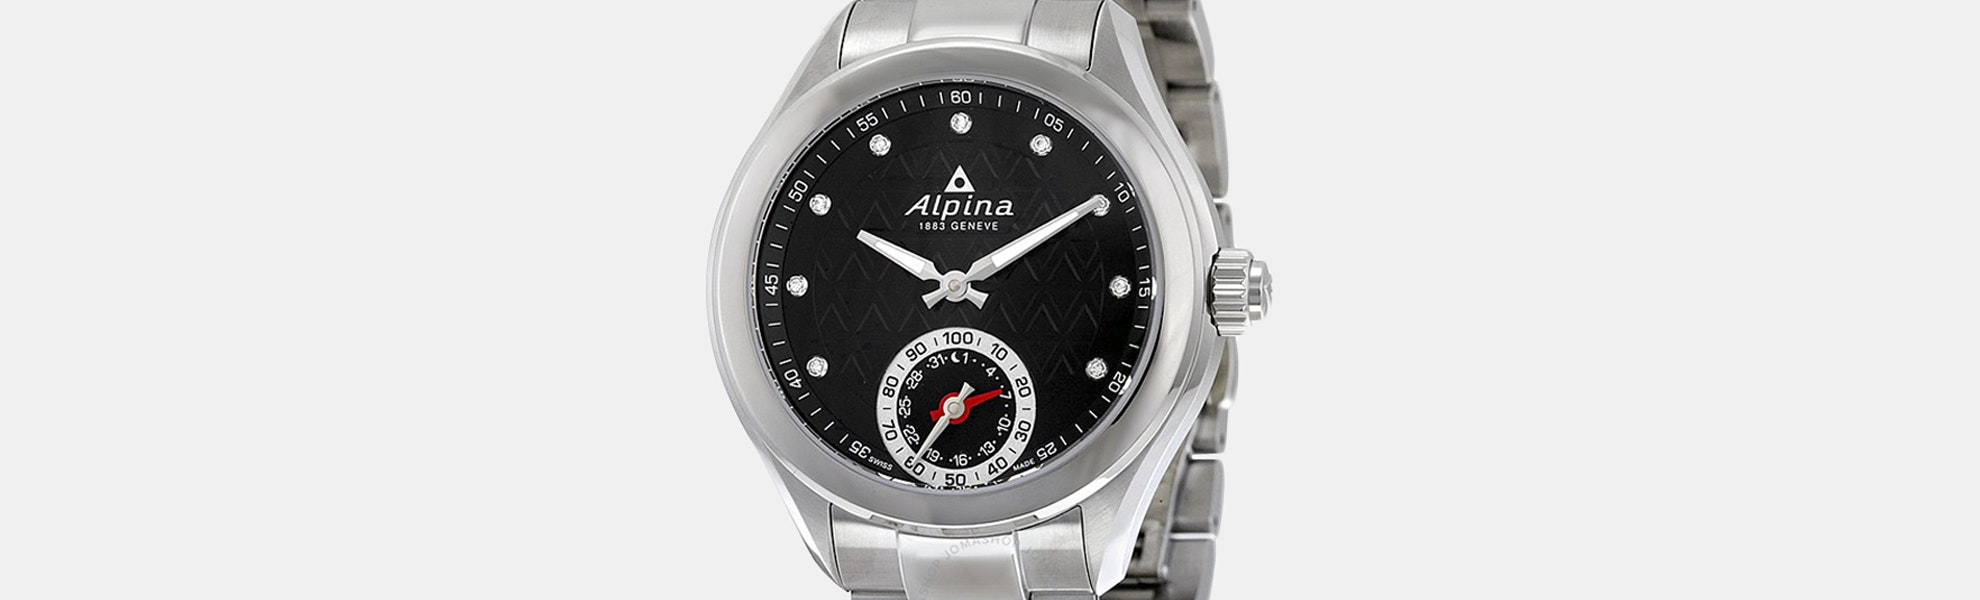 Alpina Ladies' Horological Smartwatch